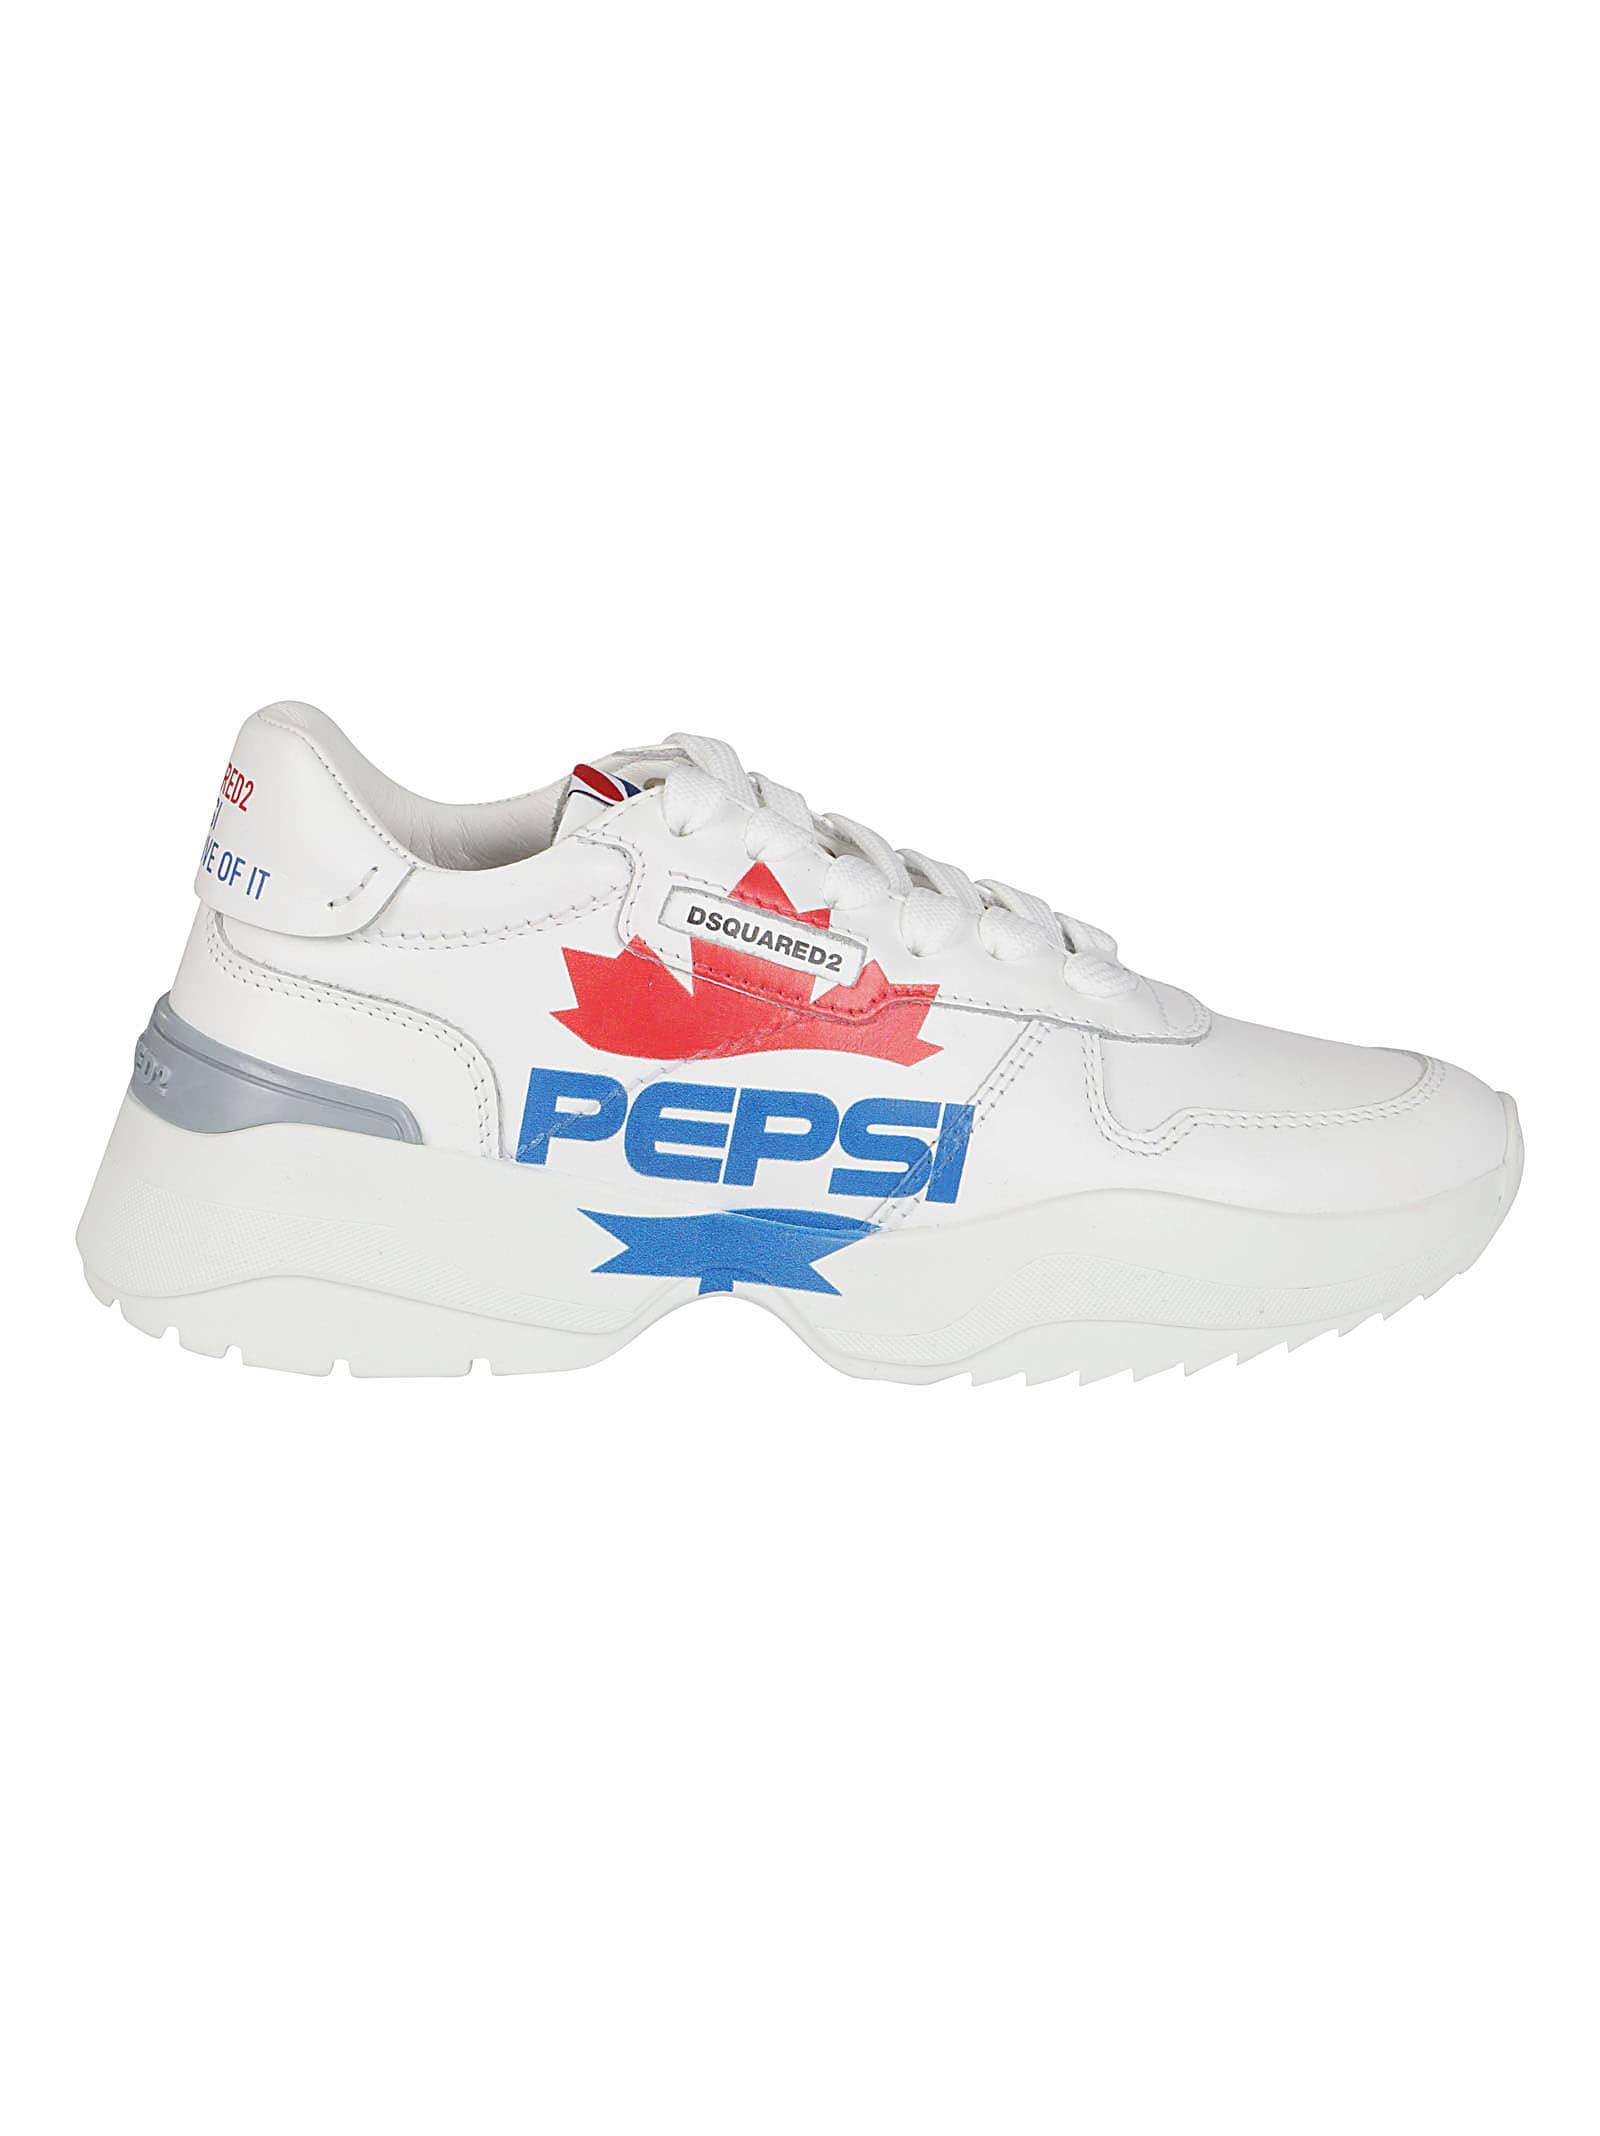 White Leather Pepsi Sneakers